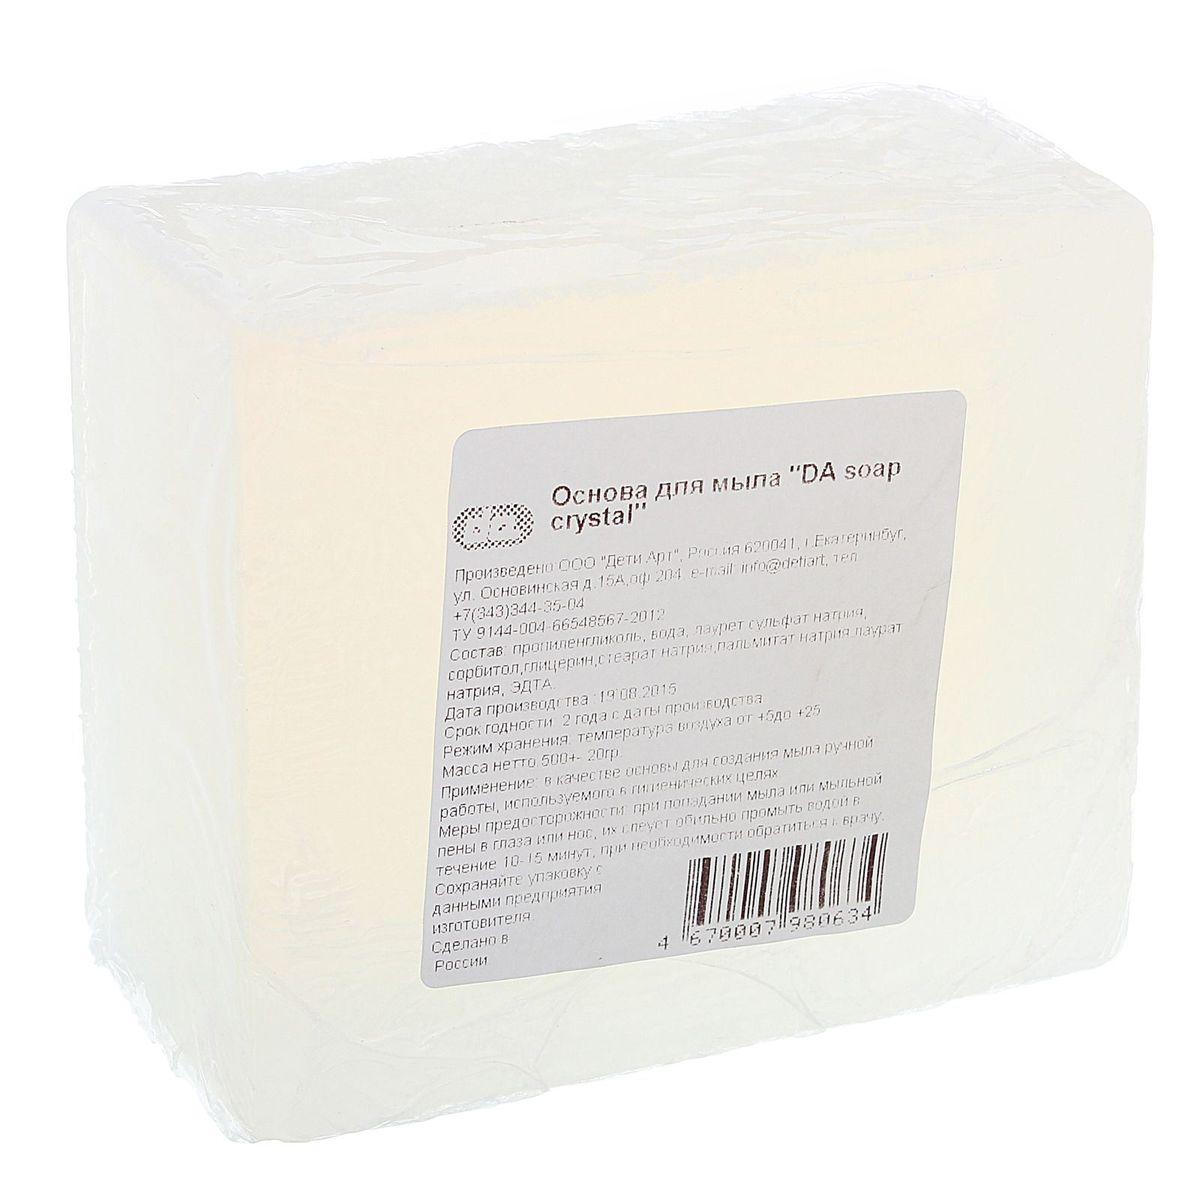 "Основа мыльная ""DA Soap Crystal"", 500 г. 1186709"